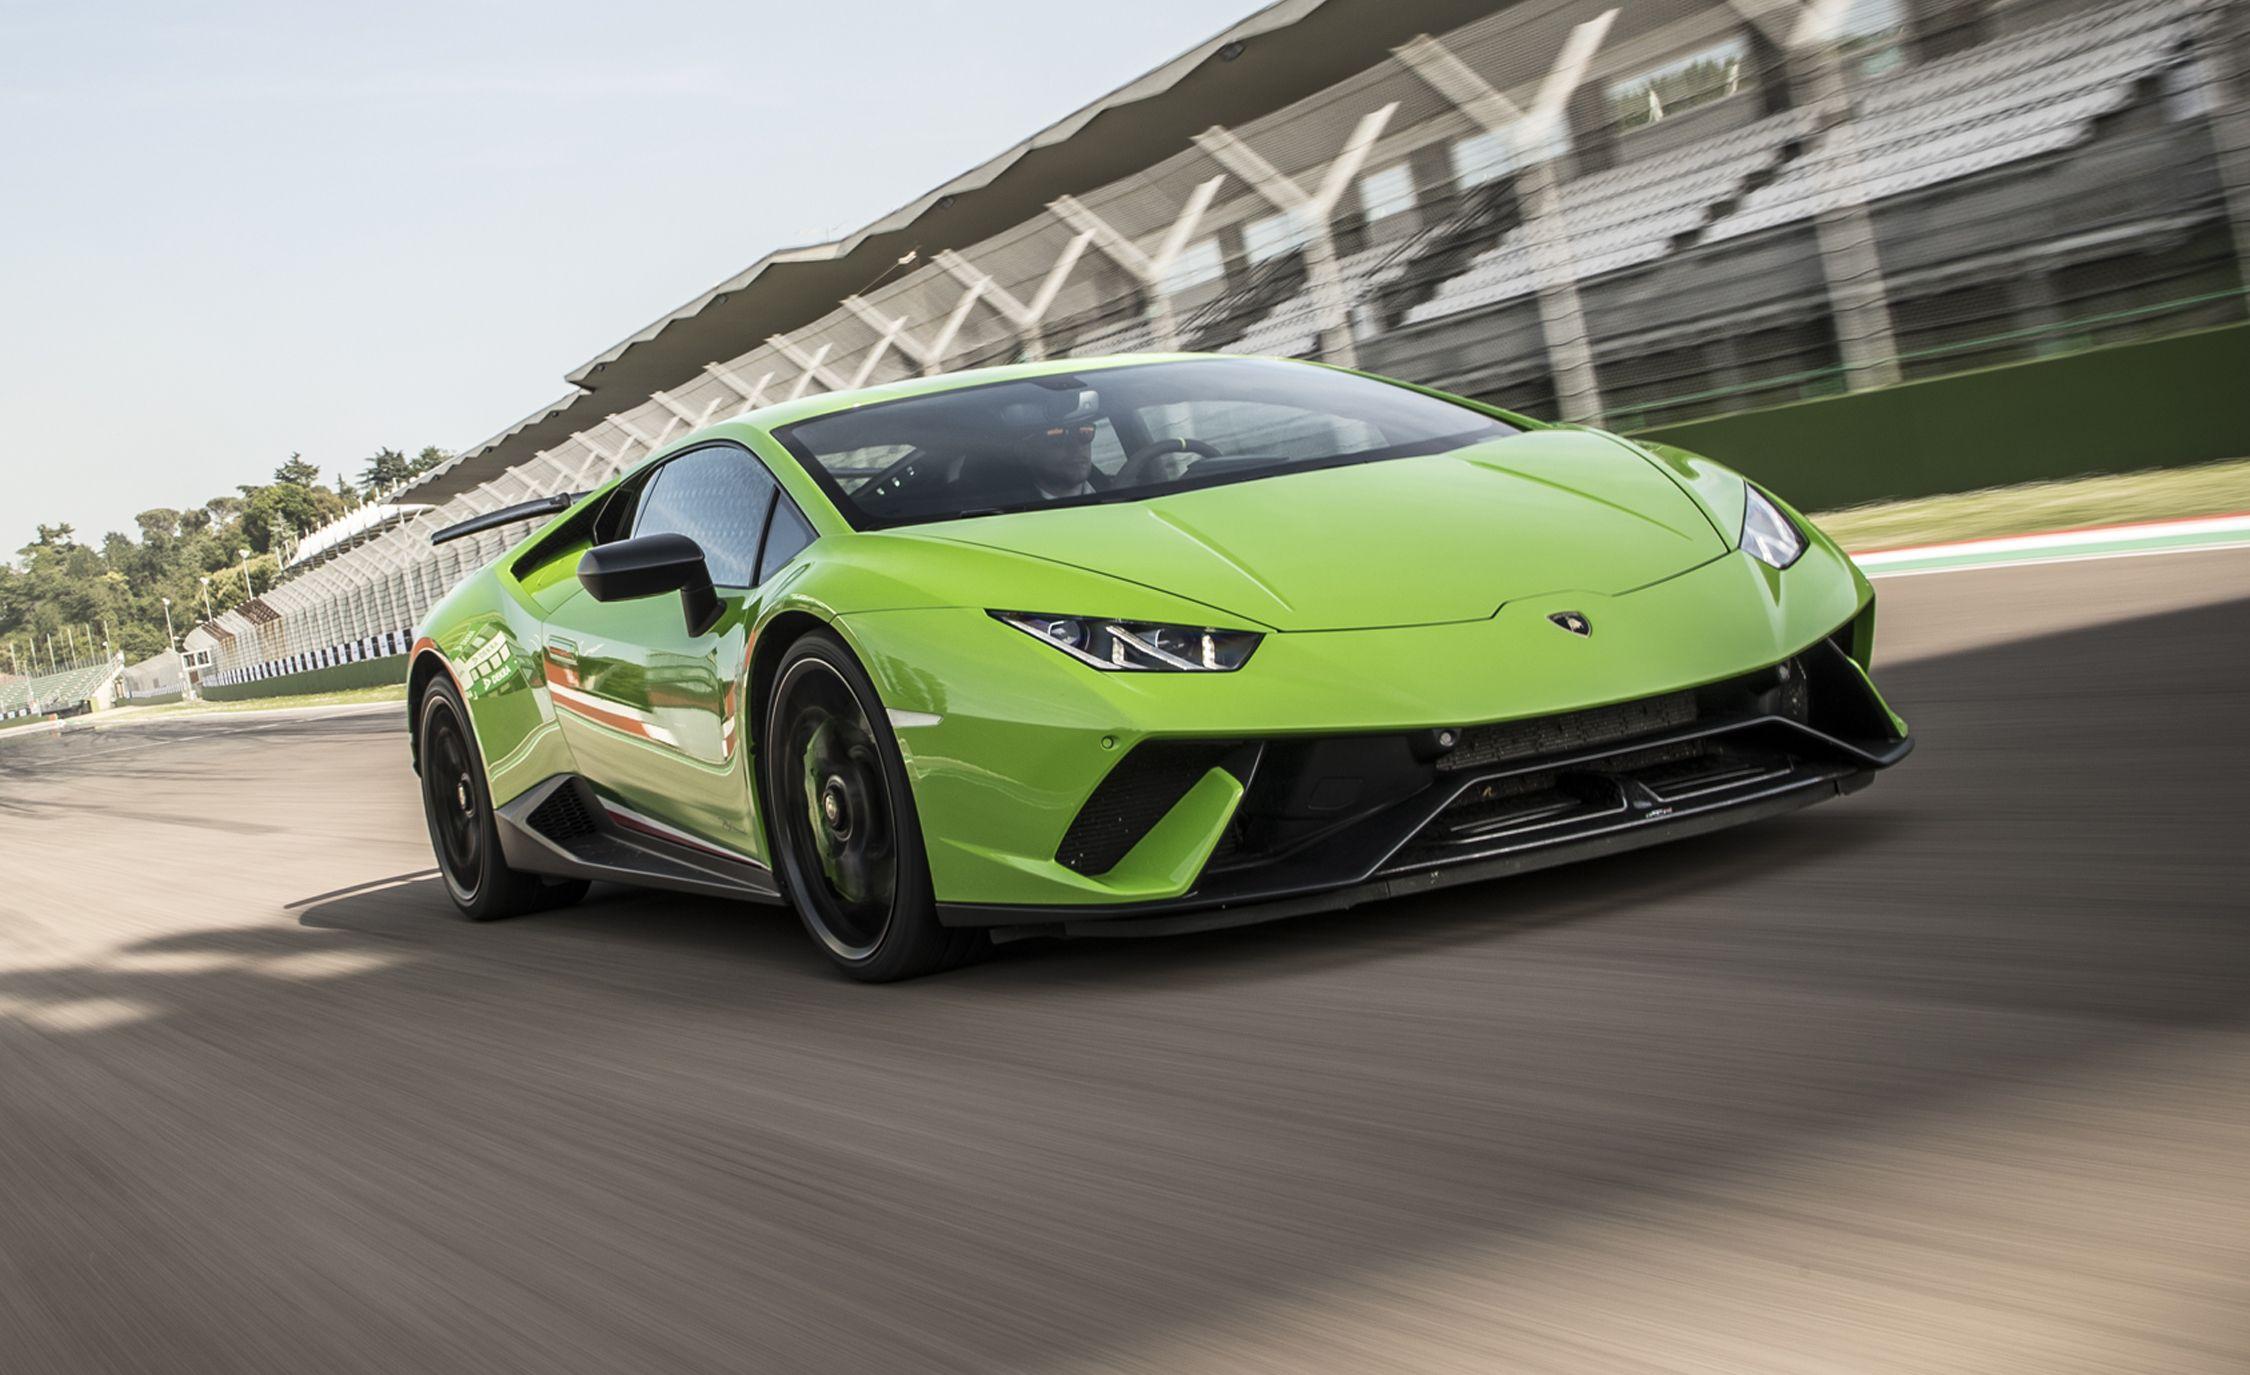 High Quality 2018 Lamborghini Huracan Performante